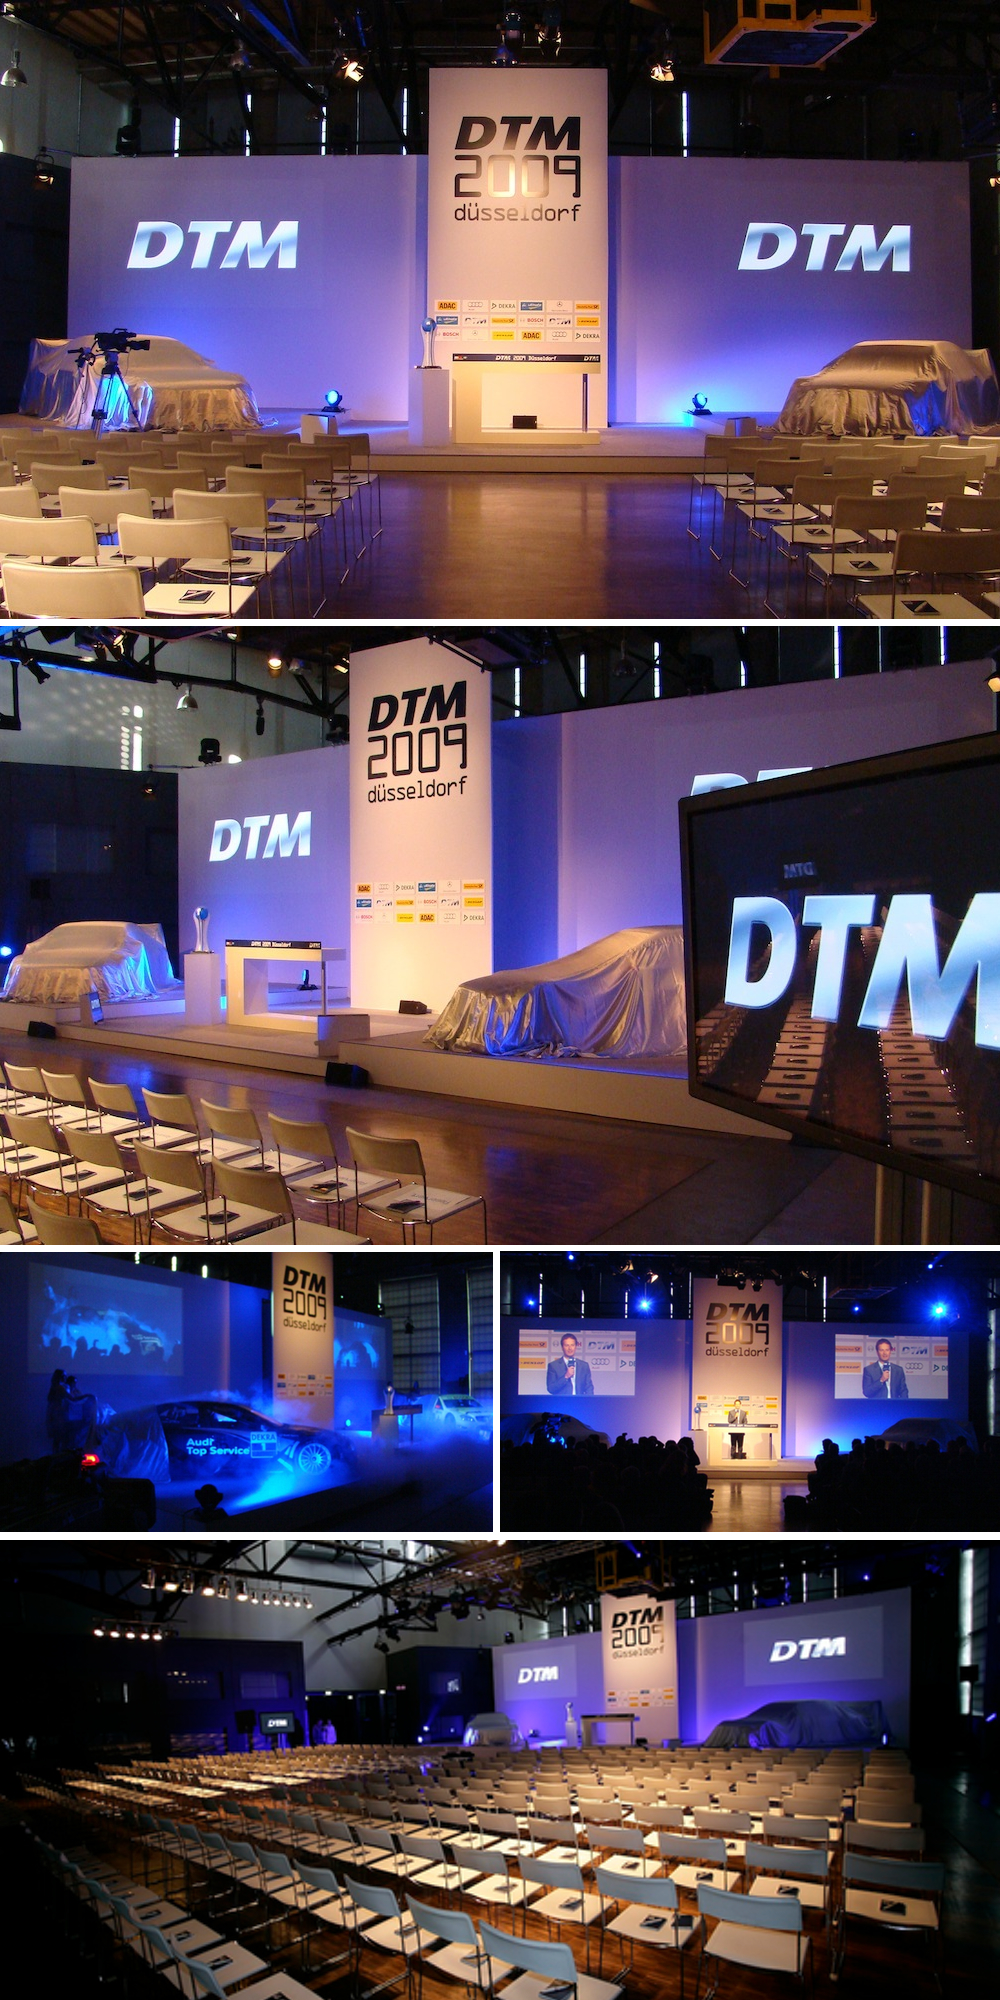 DTM_Düsseldorf 2009